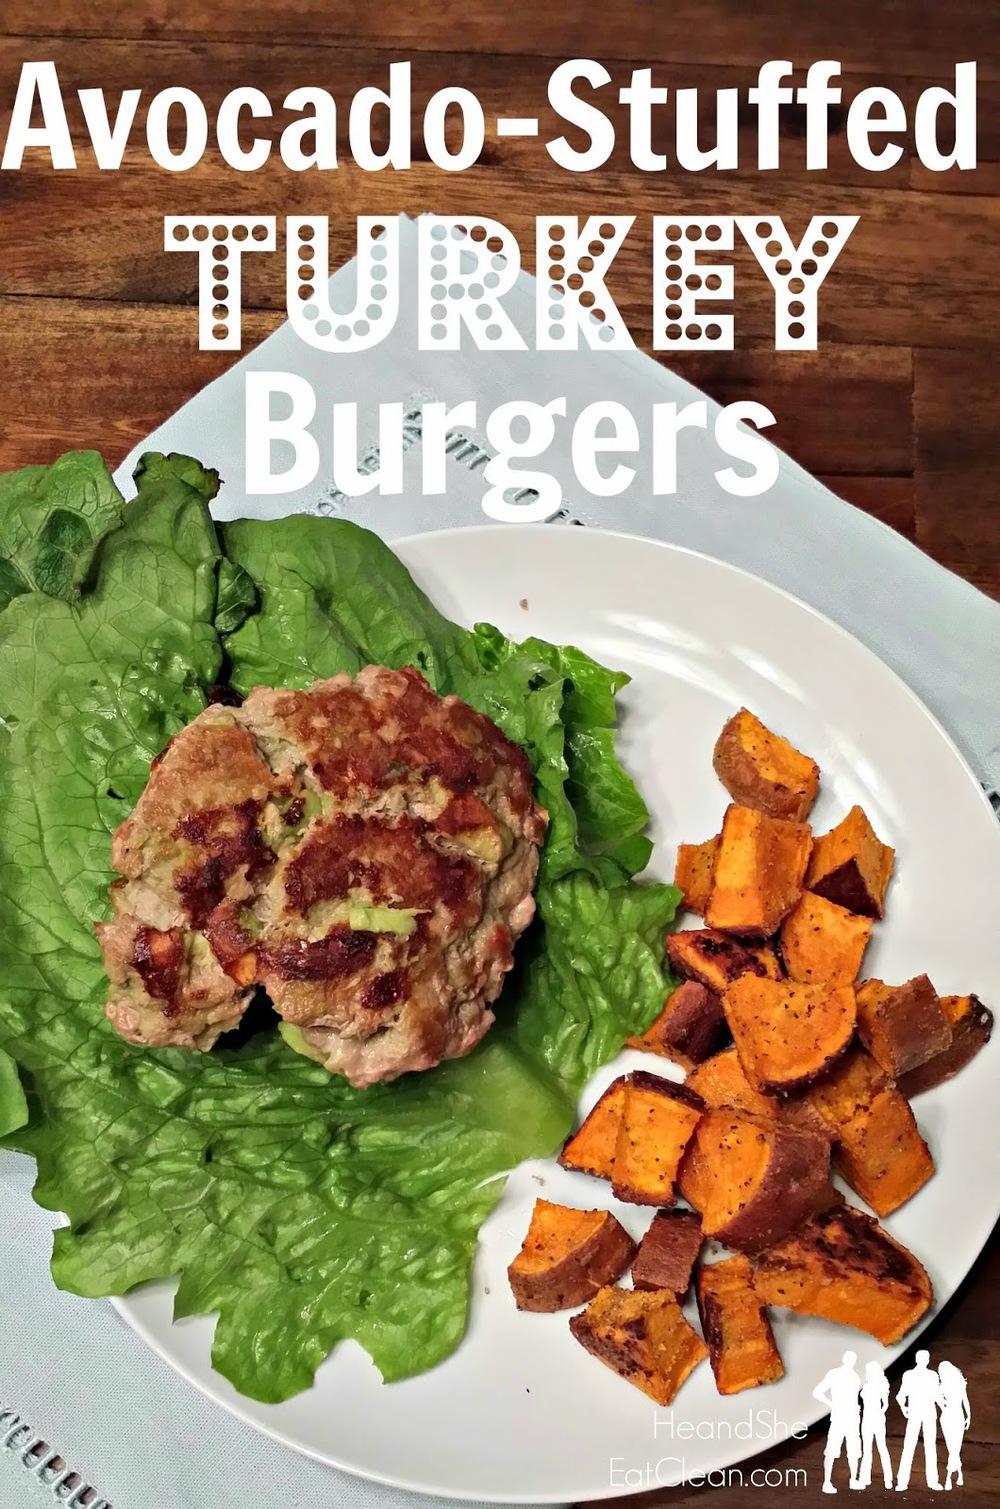 avocado-stuffed-designer-gourmet-turkey-burgers-recipe-he-she-eat-clean.jpg